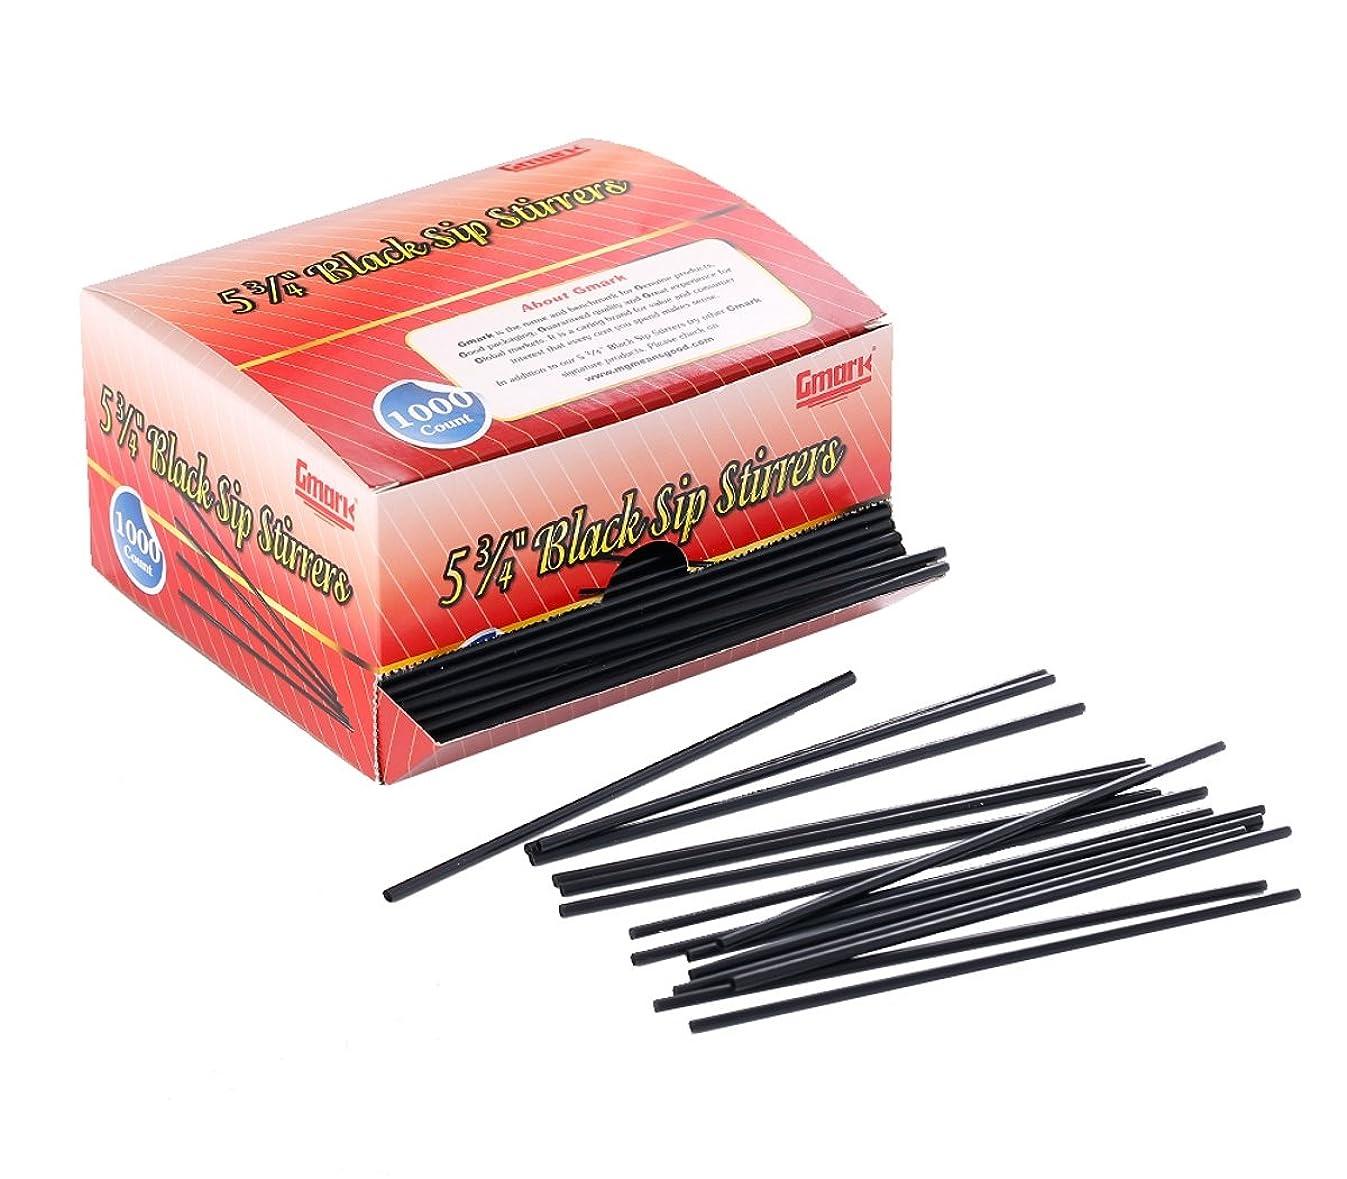 Gmark Plastic Stirrer, Sip Stirrer, Drink Stirrer Straws Black, Stir Sticks - Perfect For Coffee and Cocktail Beverage 5-3/4 Inches 2000 pcs (2 Boxes of 1000) GM1001a